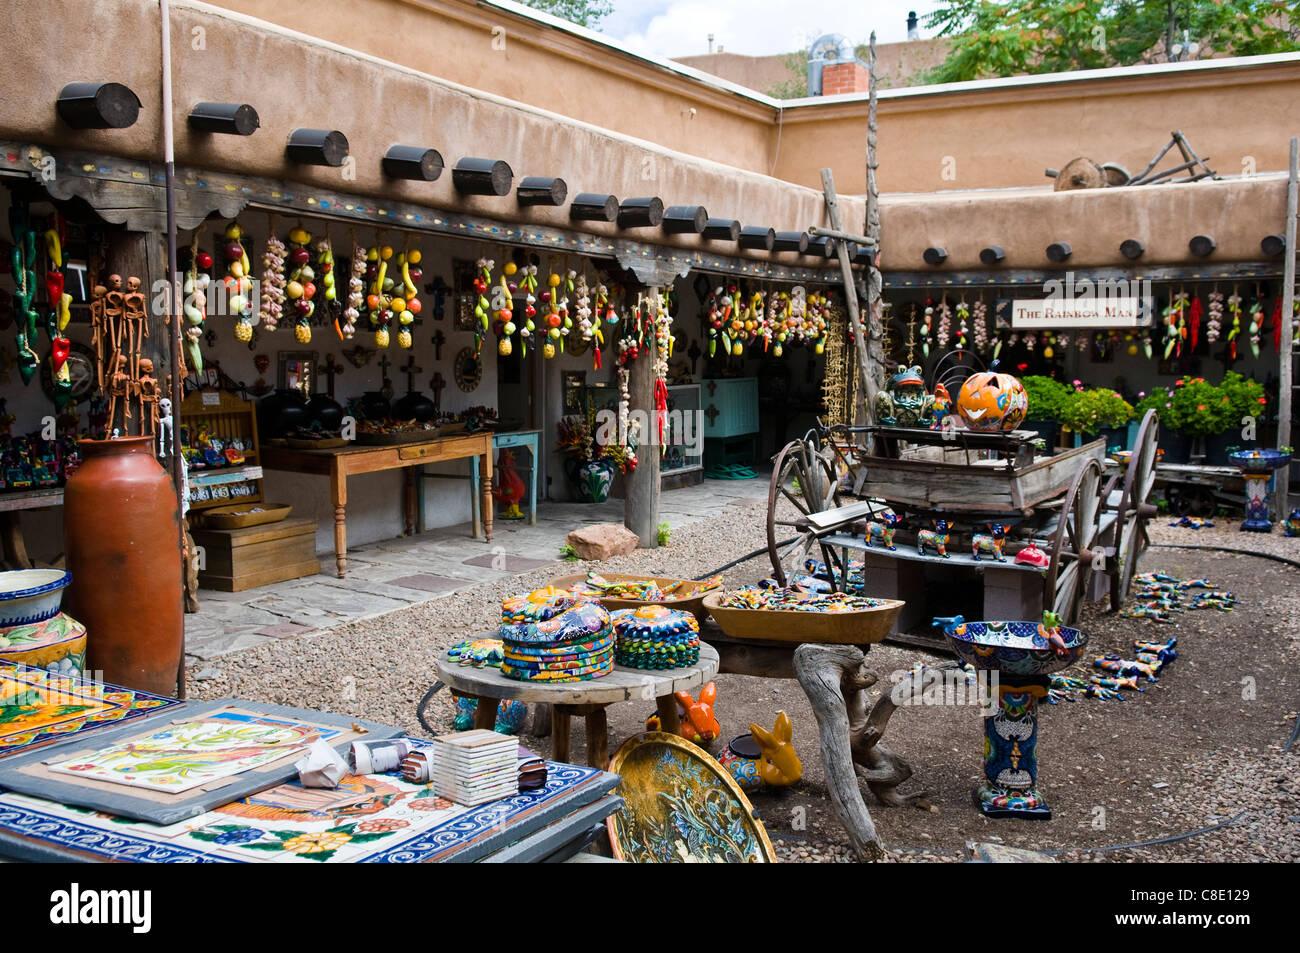 Outdoor-Markt in Santa Fe New Mexico verkaufen bunte Fliesen, Platten, Kunstwerke und Keramik Stockbild